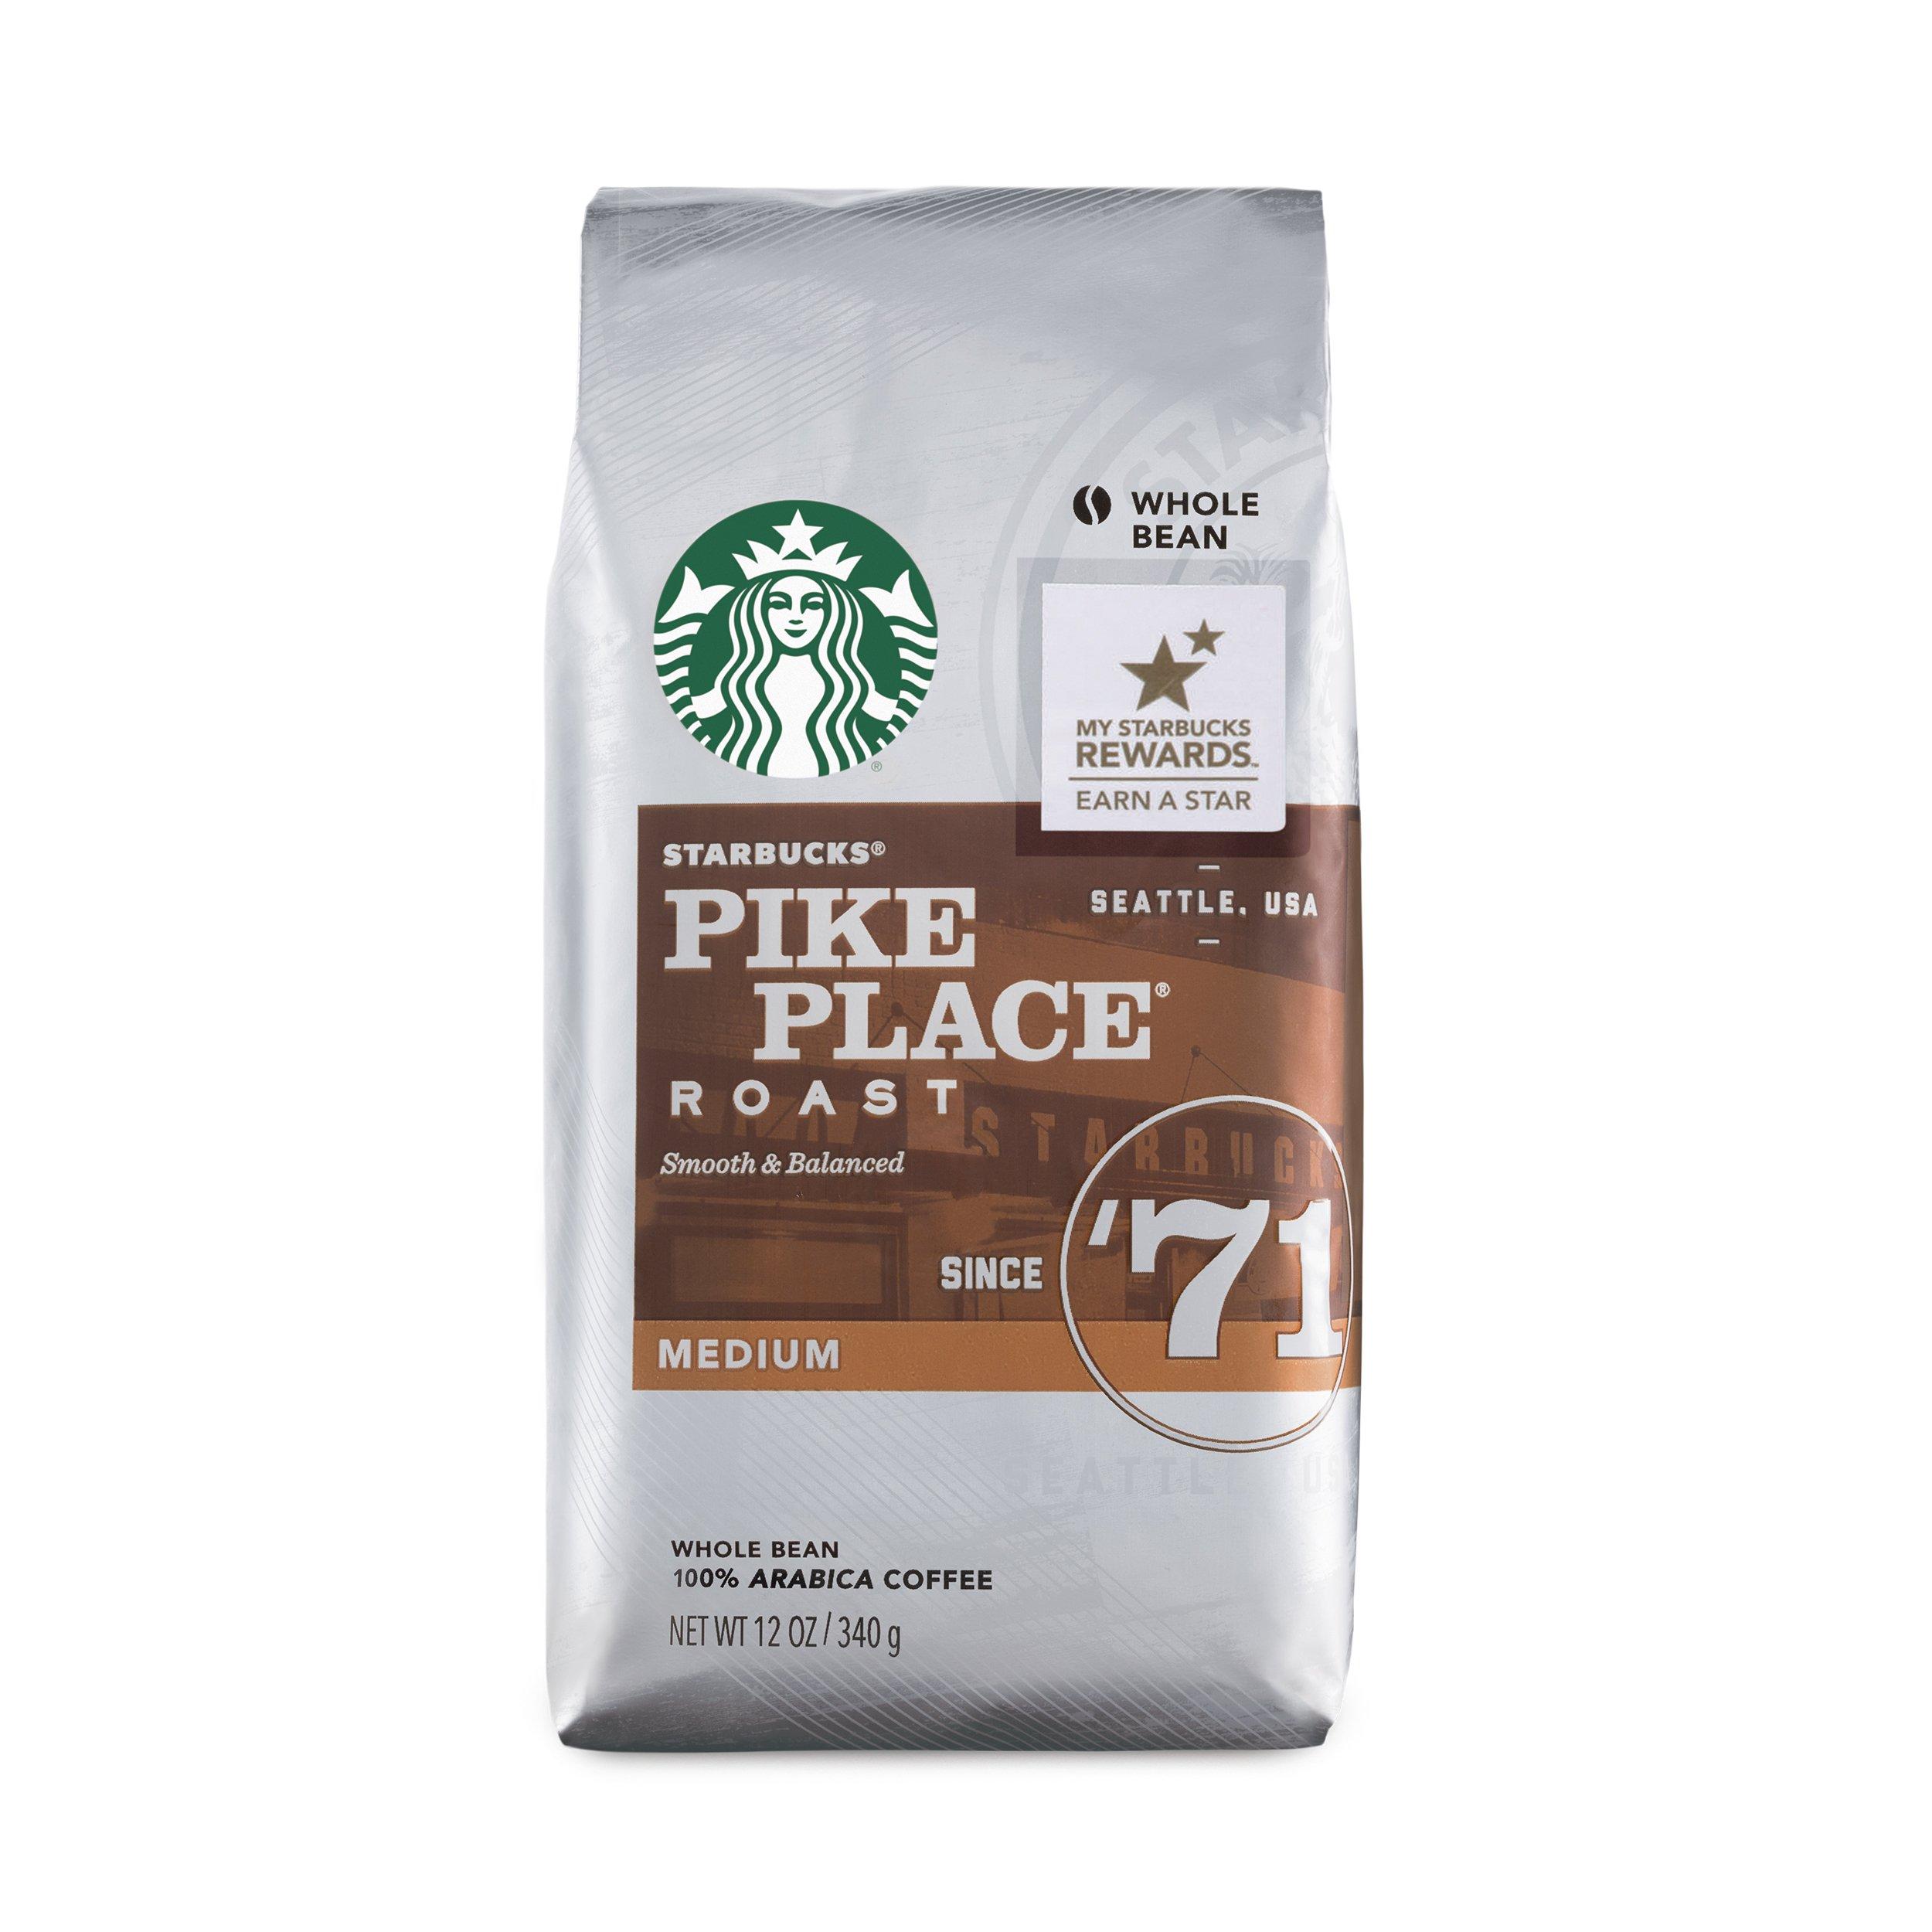 Starbucks Pike Place Roast Coffee Medium Roast Whole Bean Coffee, 12-Ounce Bag (Pack of 6) by Starbucks